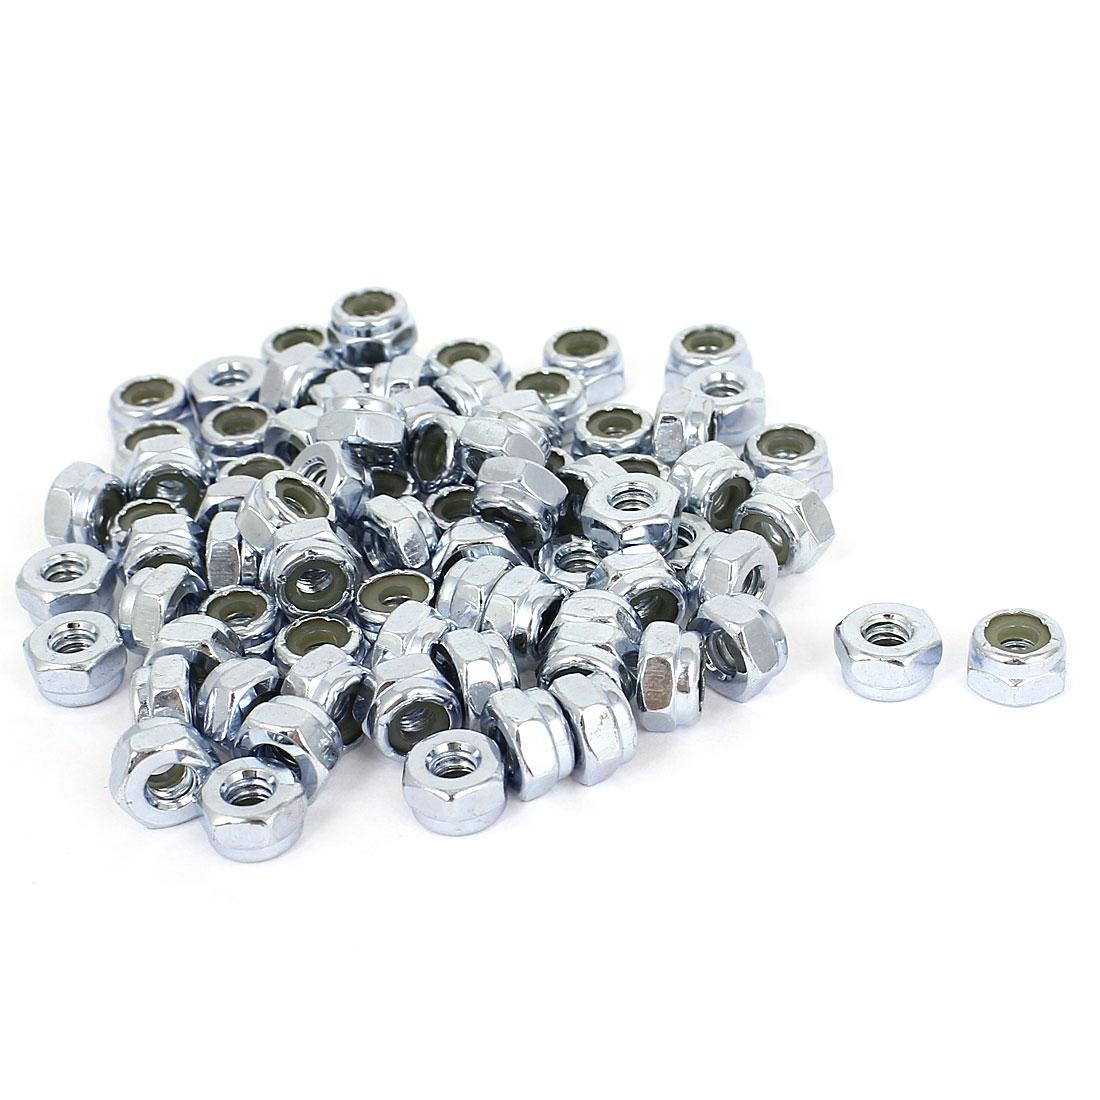 100pcs Zinc Plated Nylock Self-Locking Nylon Insert Hex Lock Nuts #10-24